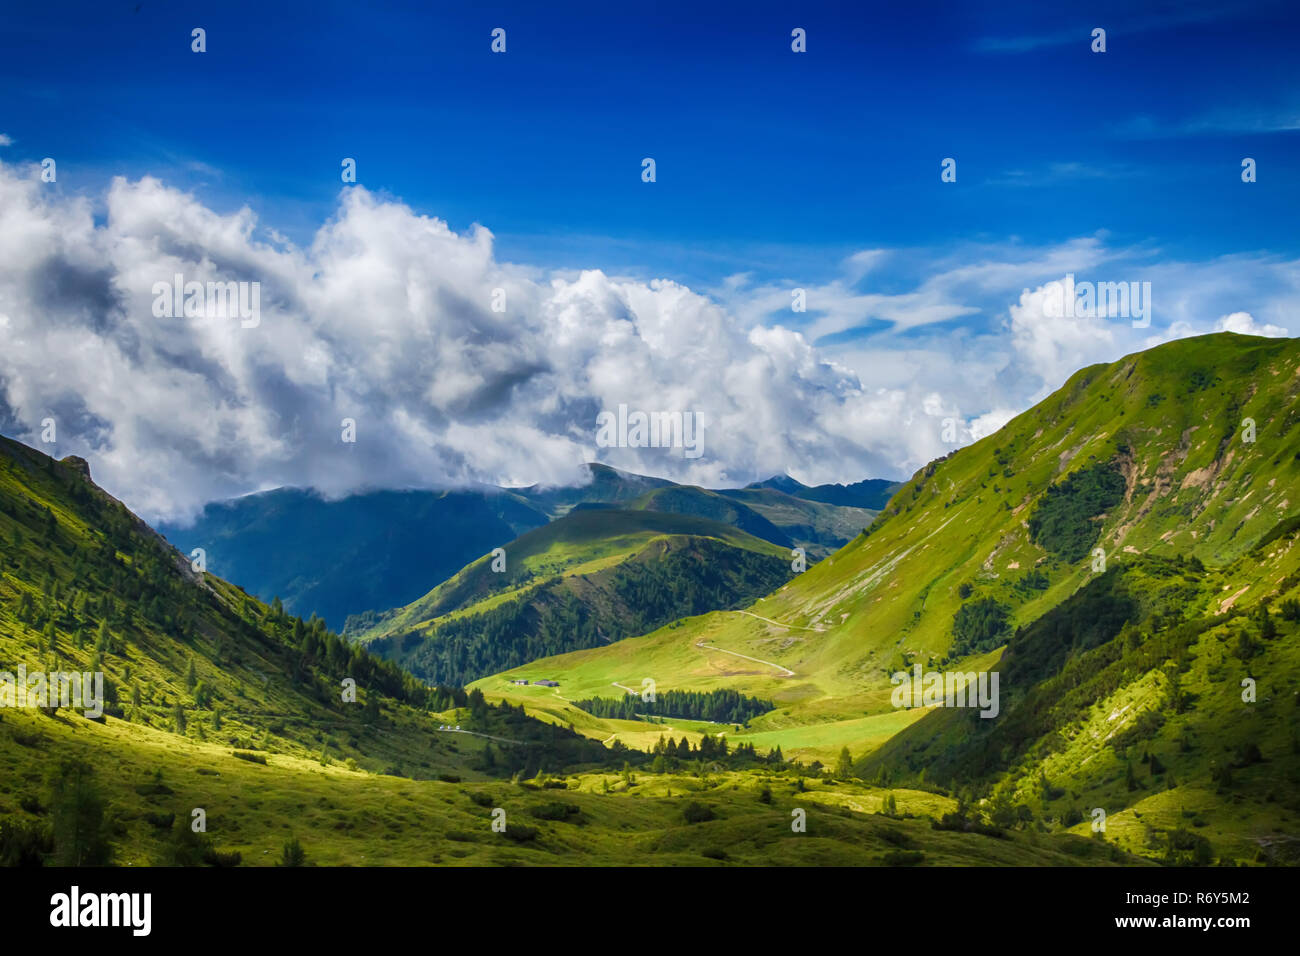 beautyfull mountain landscape in bagolino,lombardy,italy - Stock Image